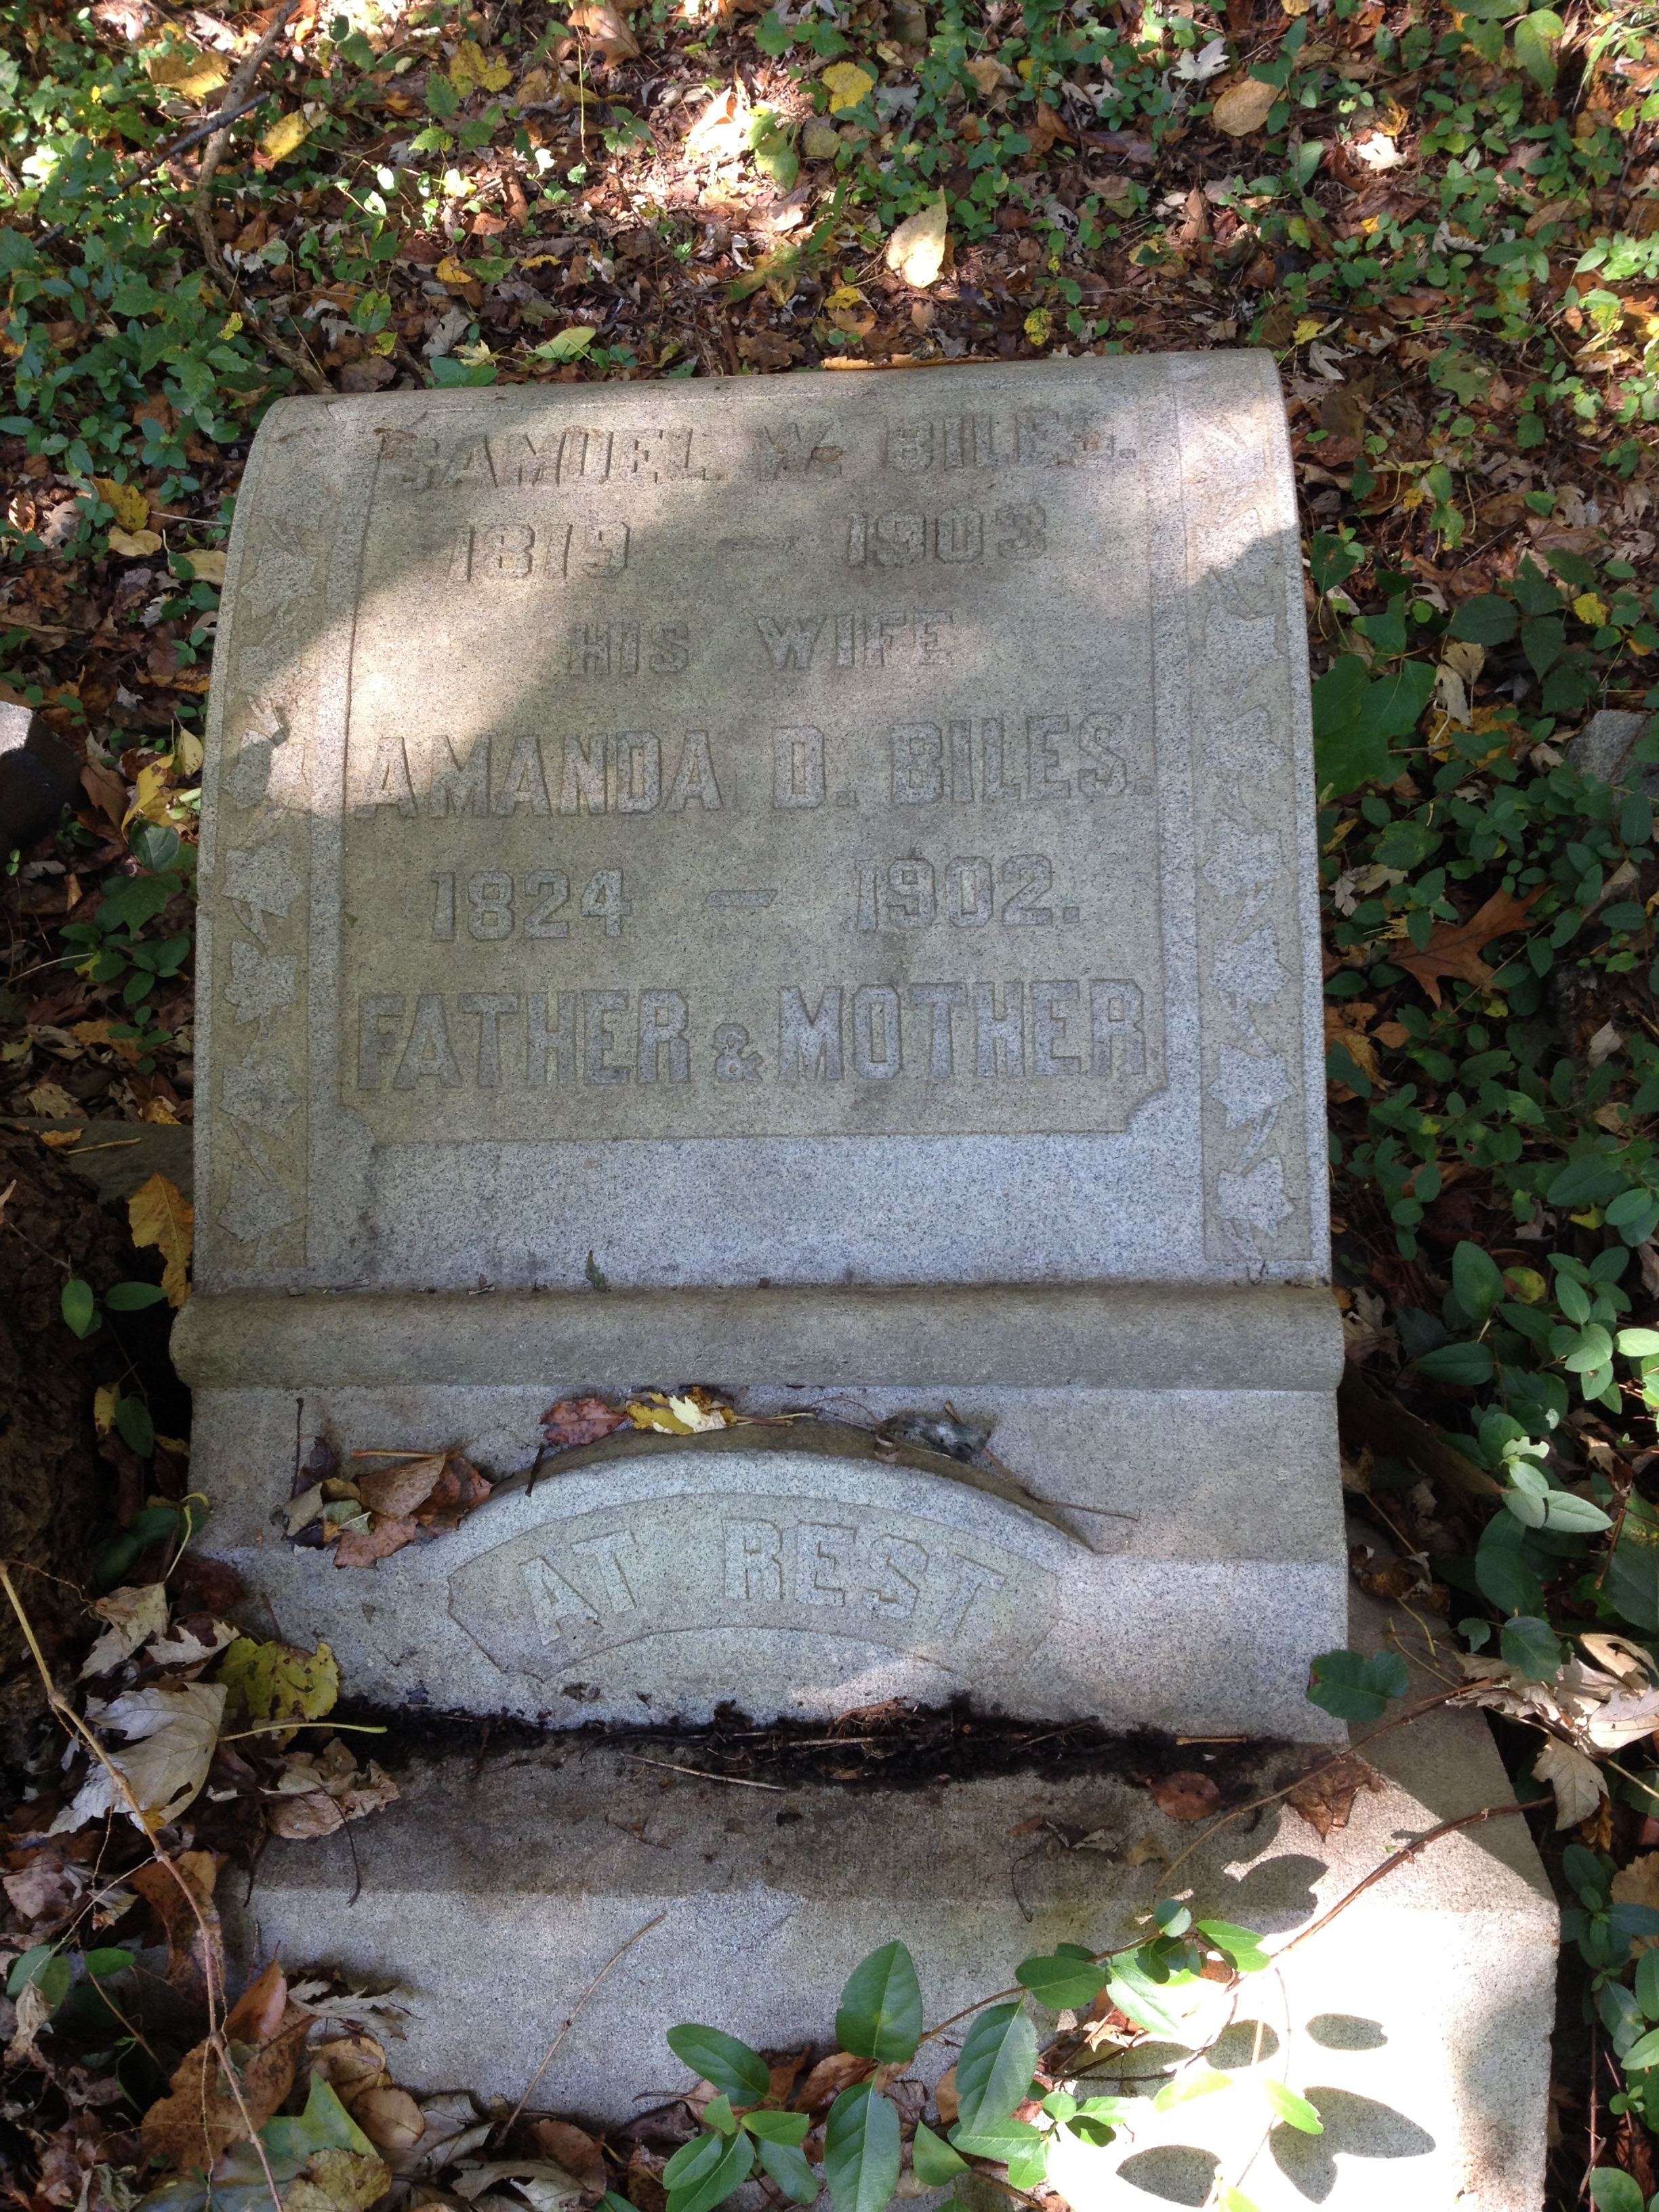 Samuel W. Biles